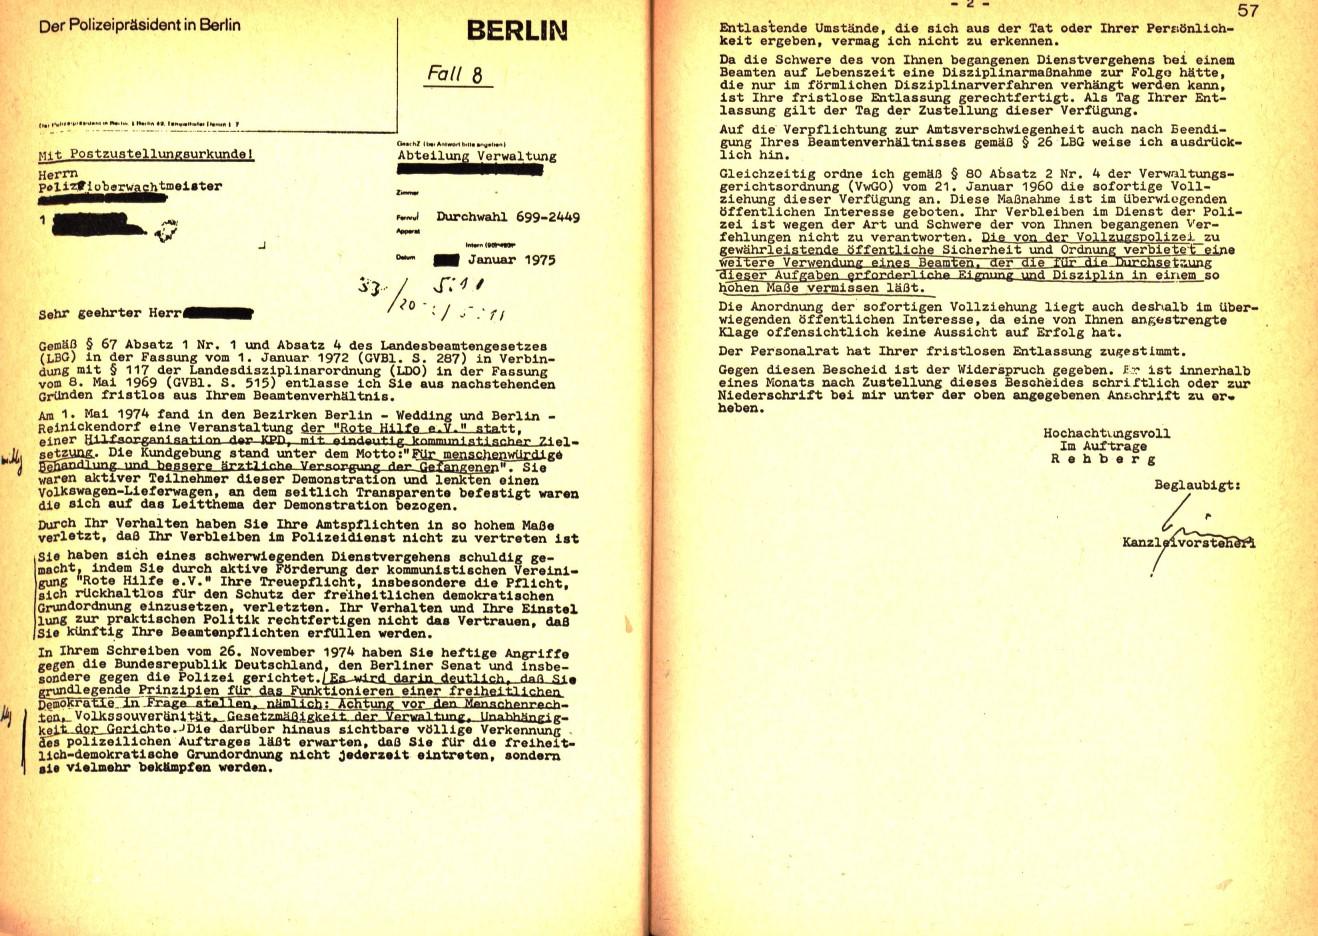 Berlin_VDS_Aktionskomitee_1975_BerufsverboteII_30